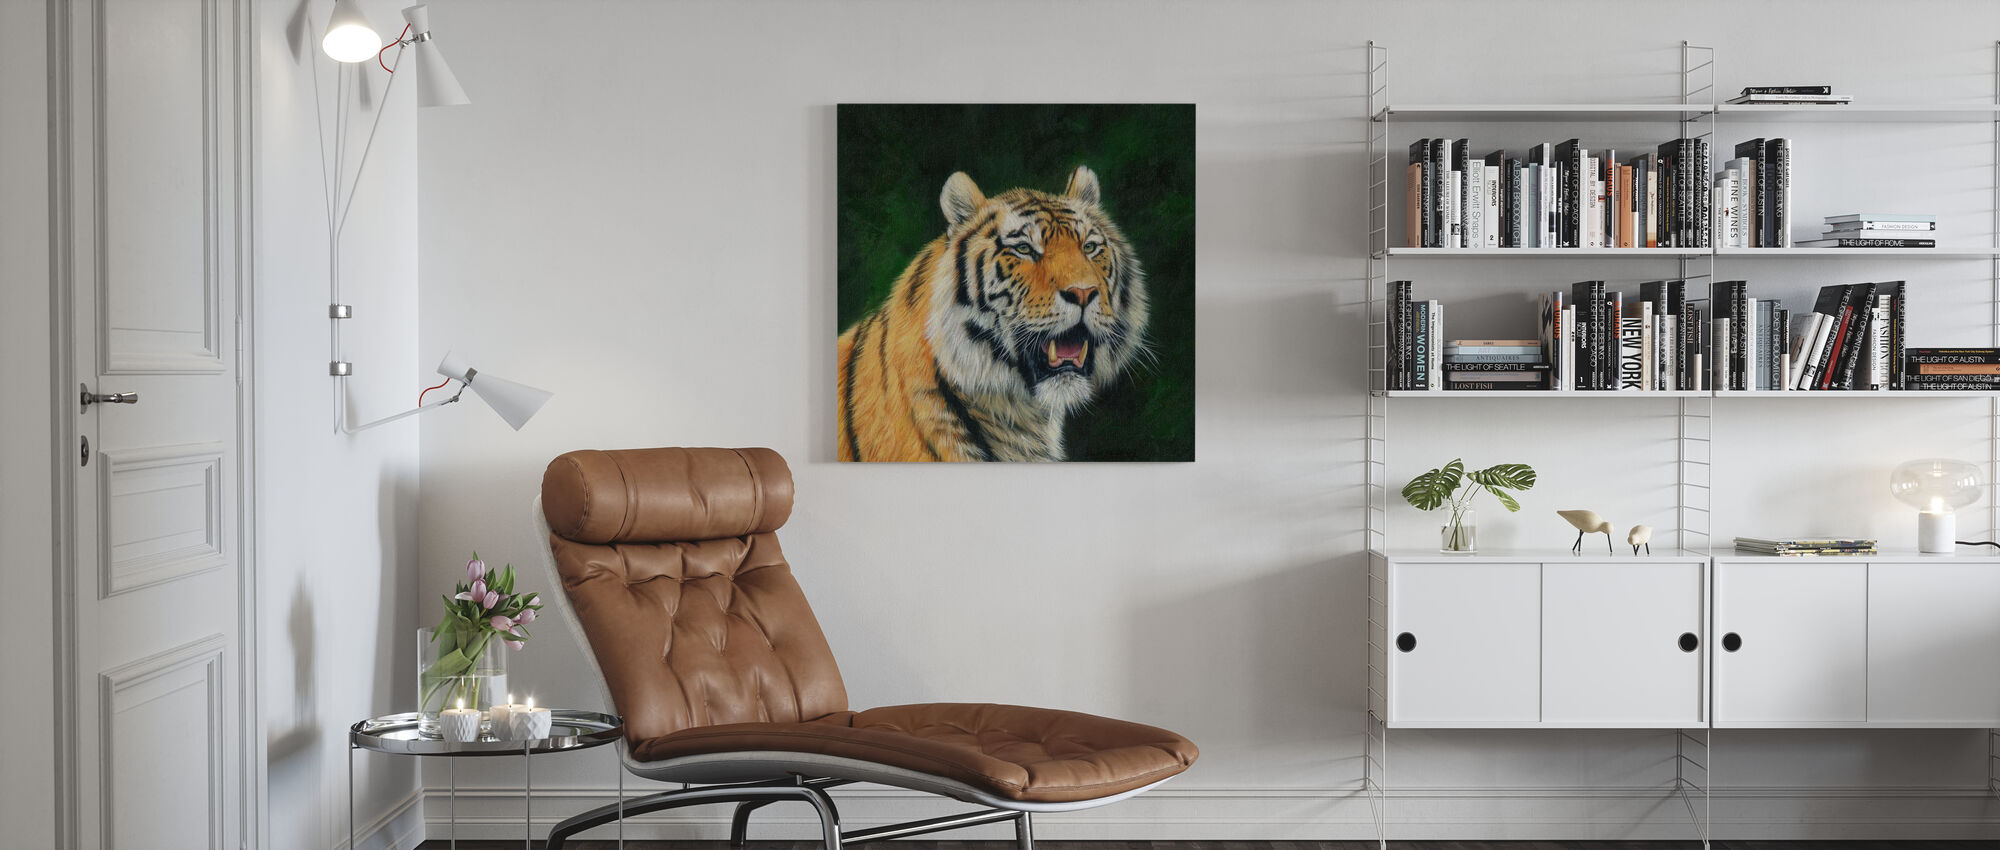 Rijpe Amoer Tijger - Canvas print - Woonkamer